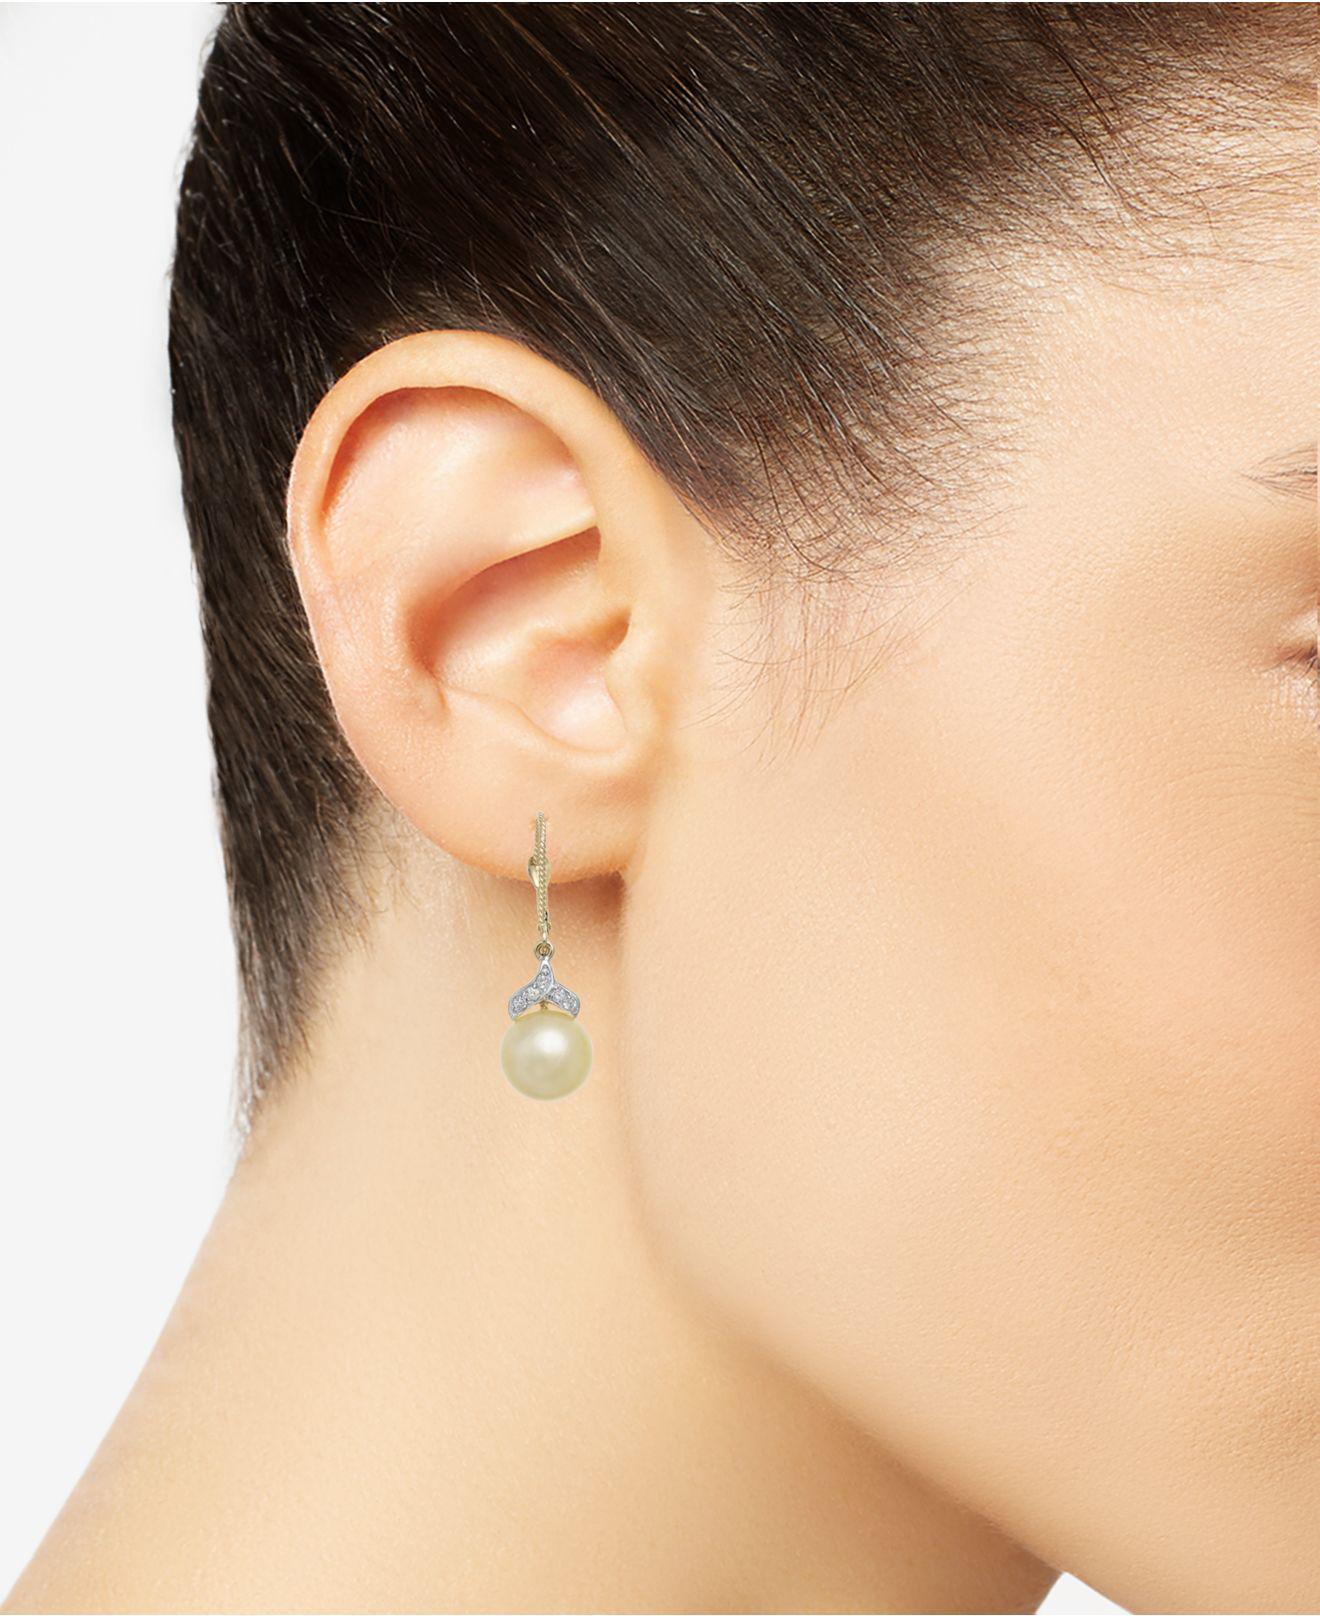 Lyst Macy S Cultured Golden South Sea Pearl 9mm And Diamond 1 8 Ct T W Drop Earrings In 14k Gold Metallic